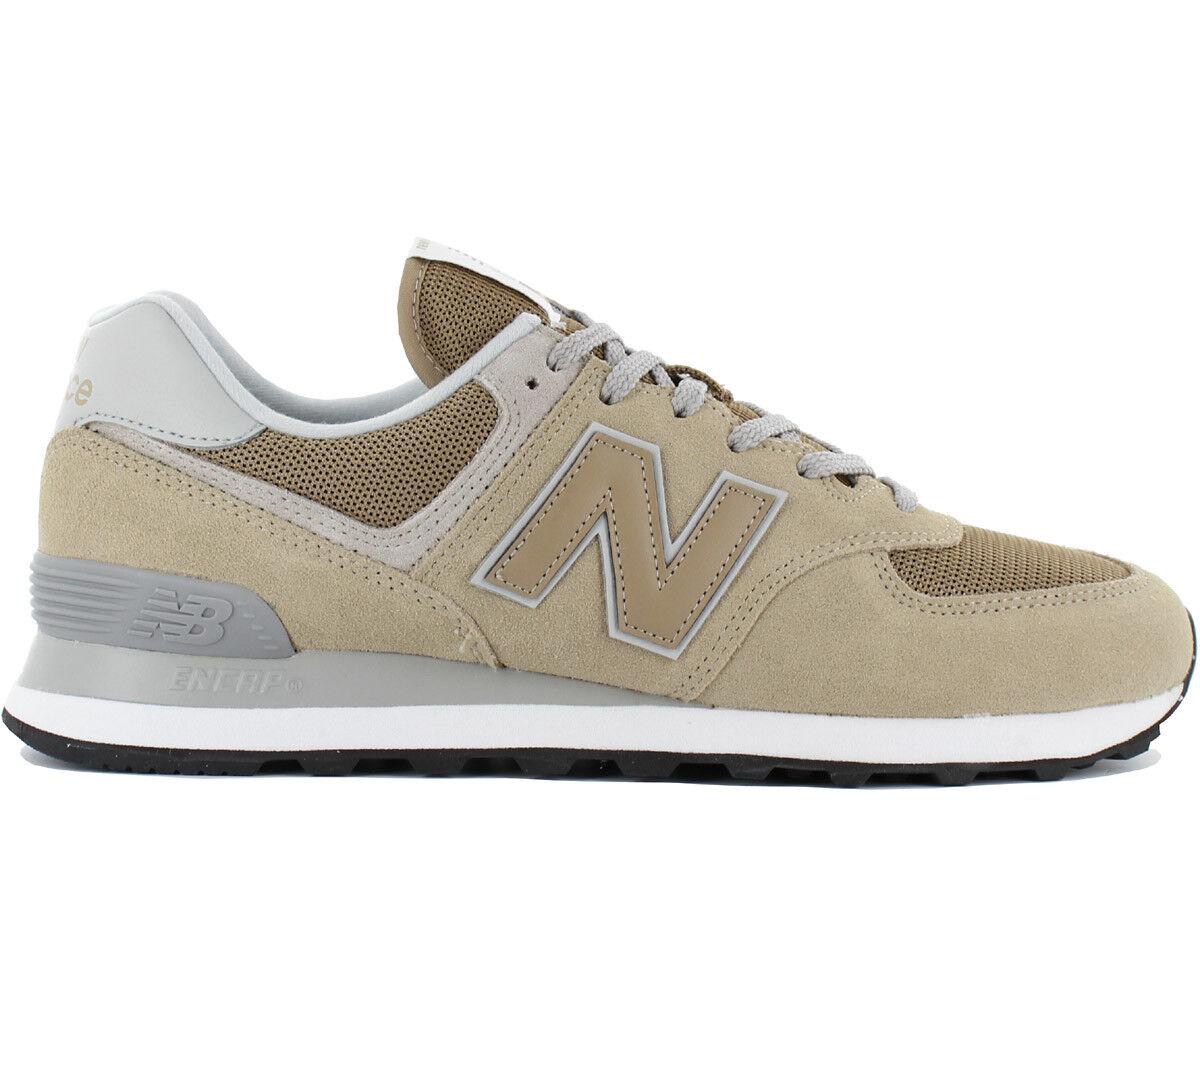 New Balance Classics 574 Herren Sneaker Schuhe Beige Braun ML574EBE Turnschuhe